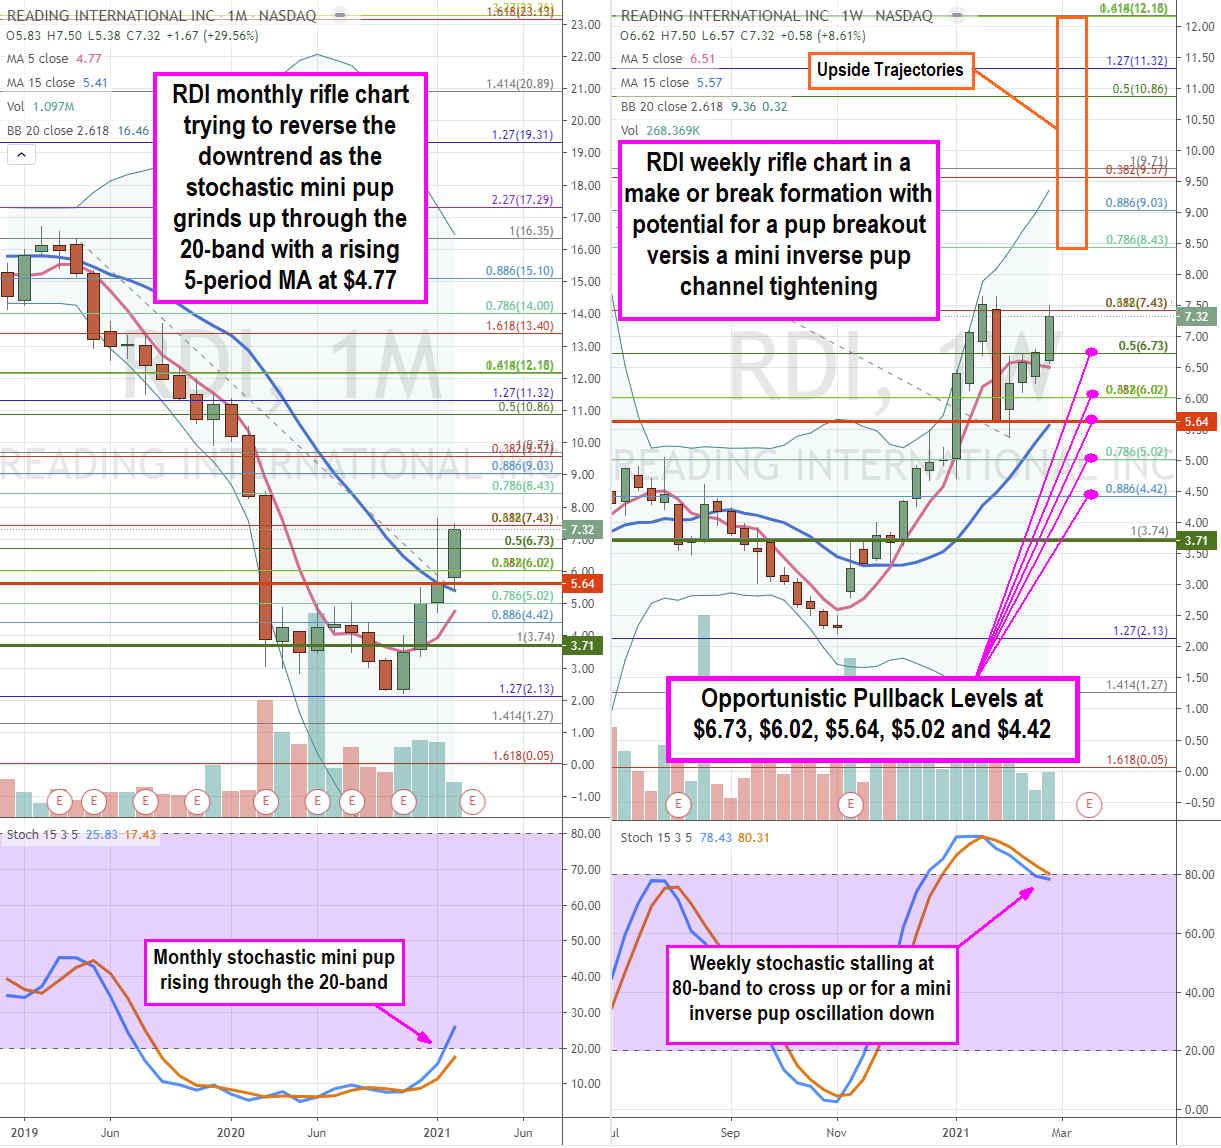 Reading International (NASDAQ: RDI) Stock is an Under the Radar Dual Reopening Play